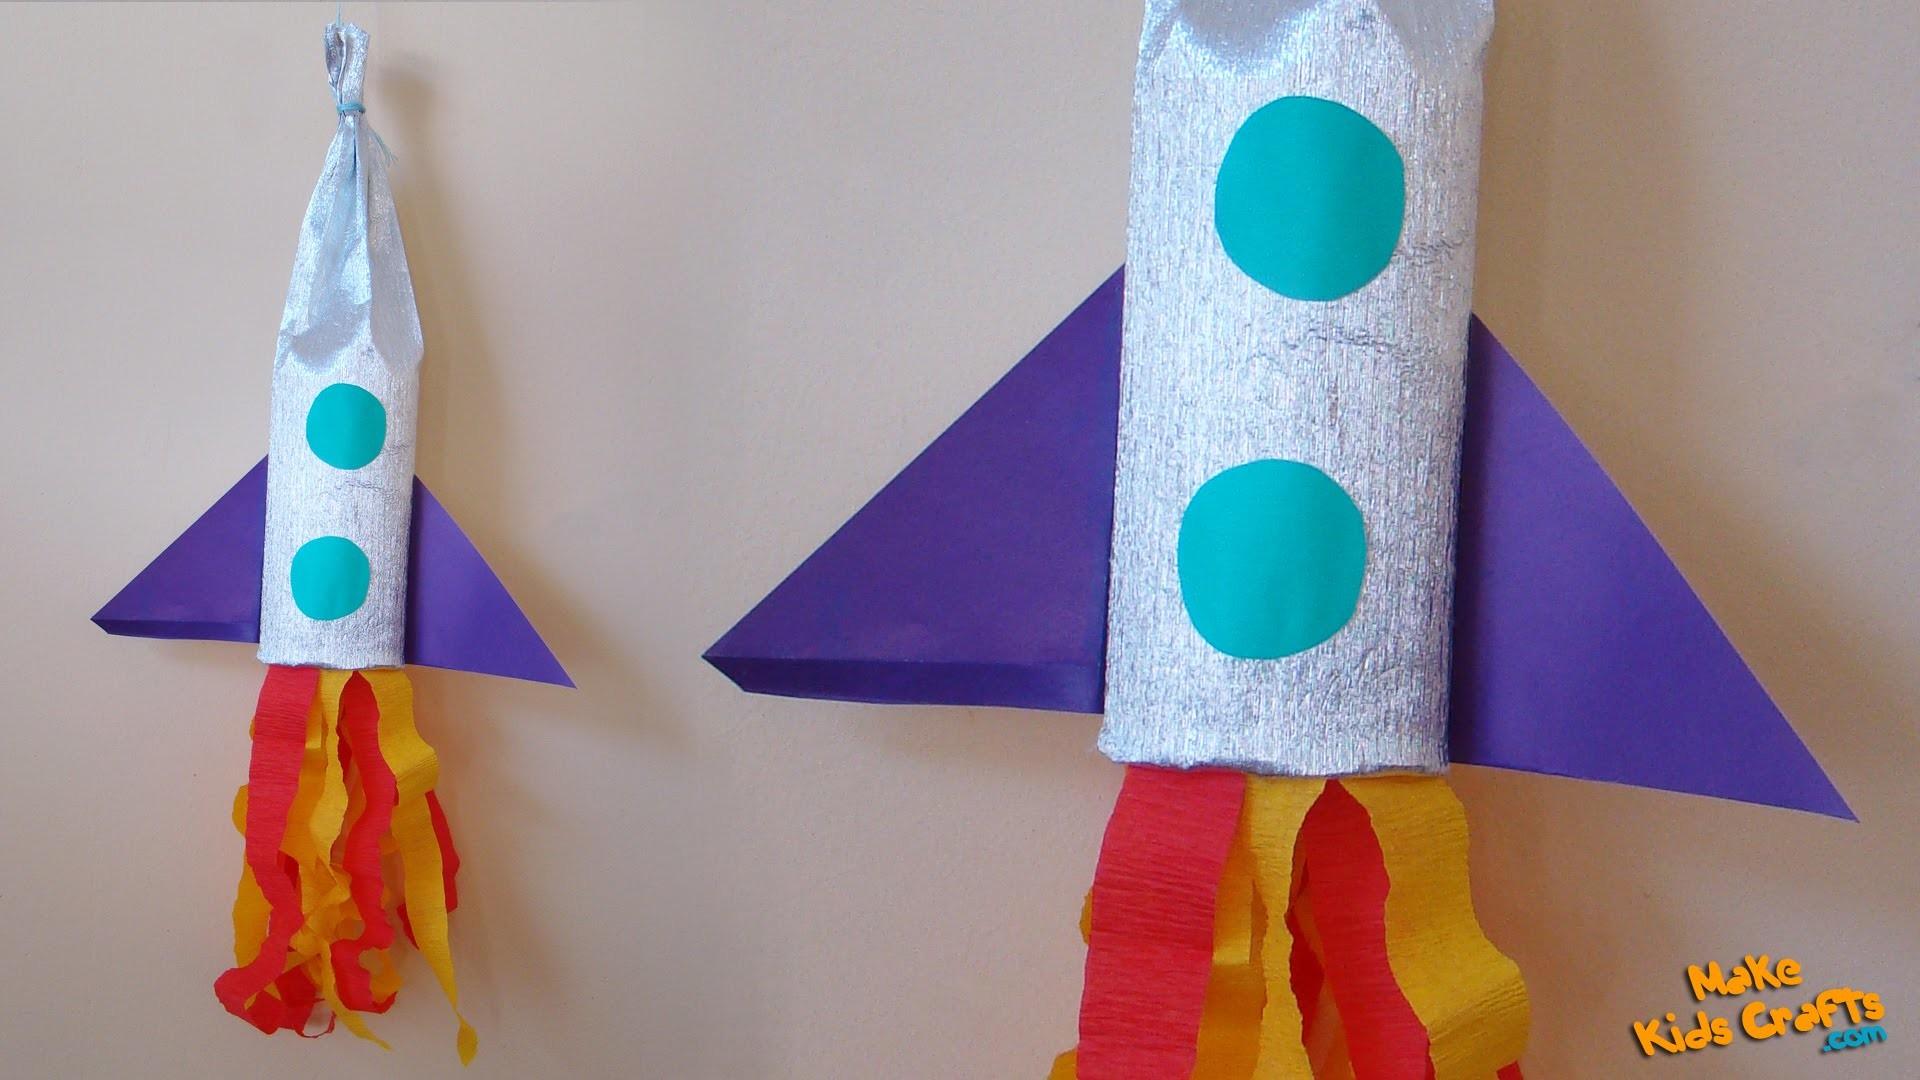 How to make a Rocket? DIY